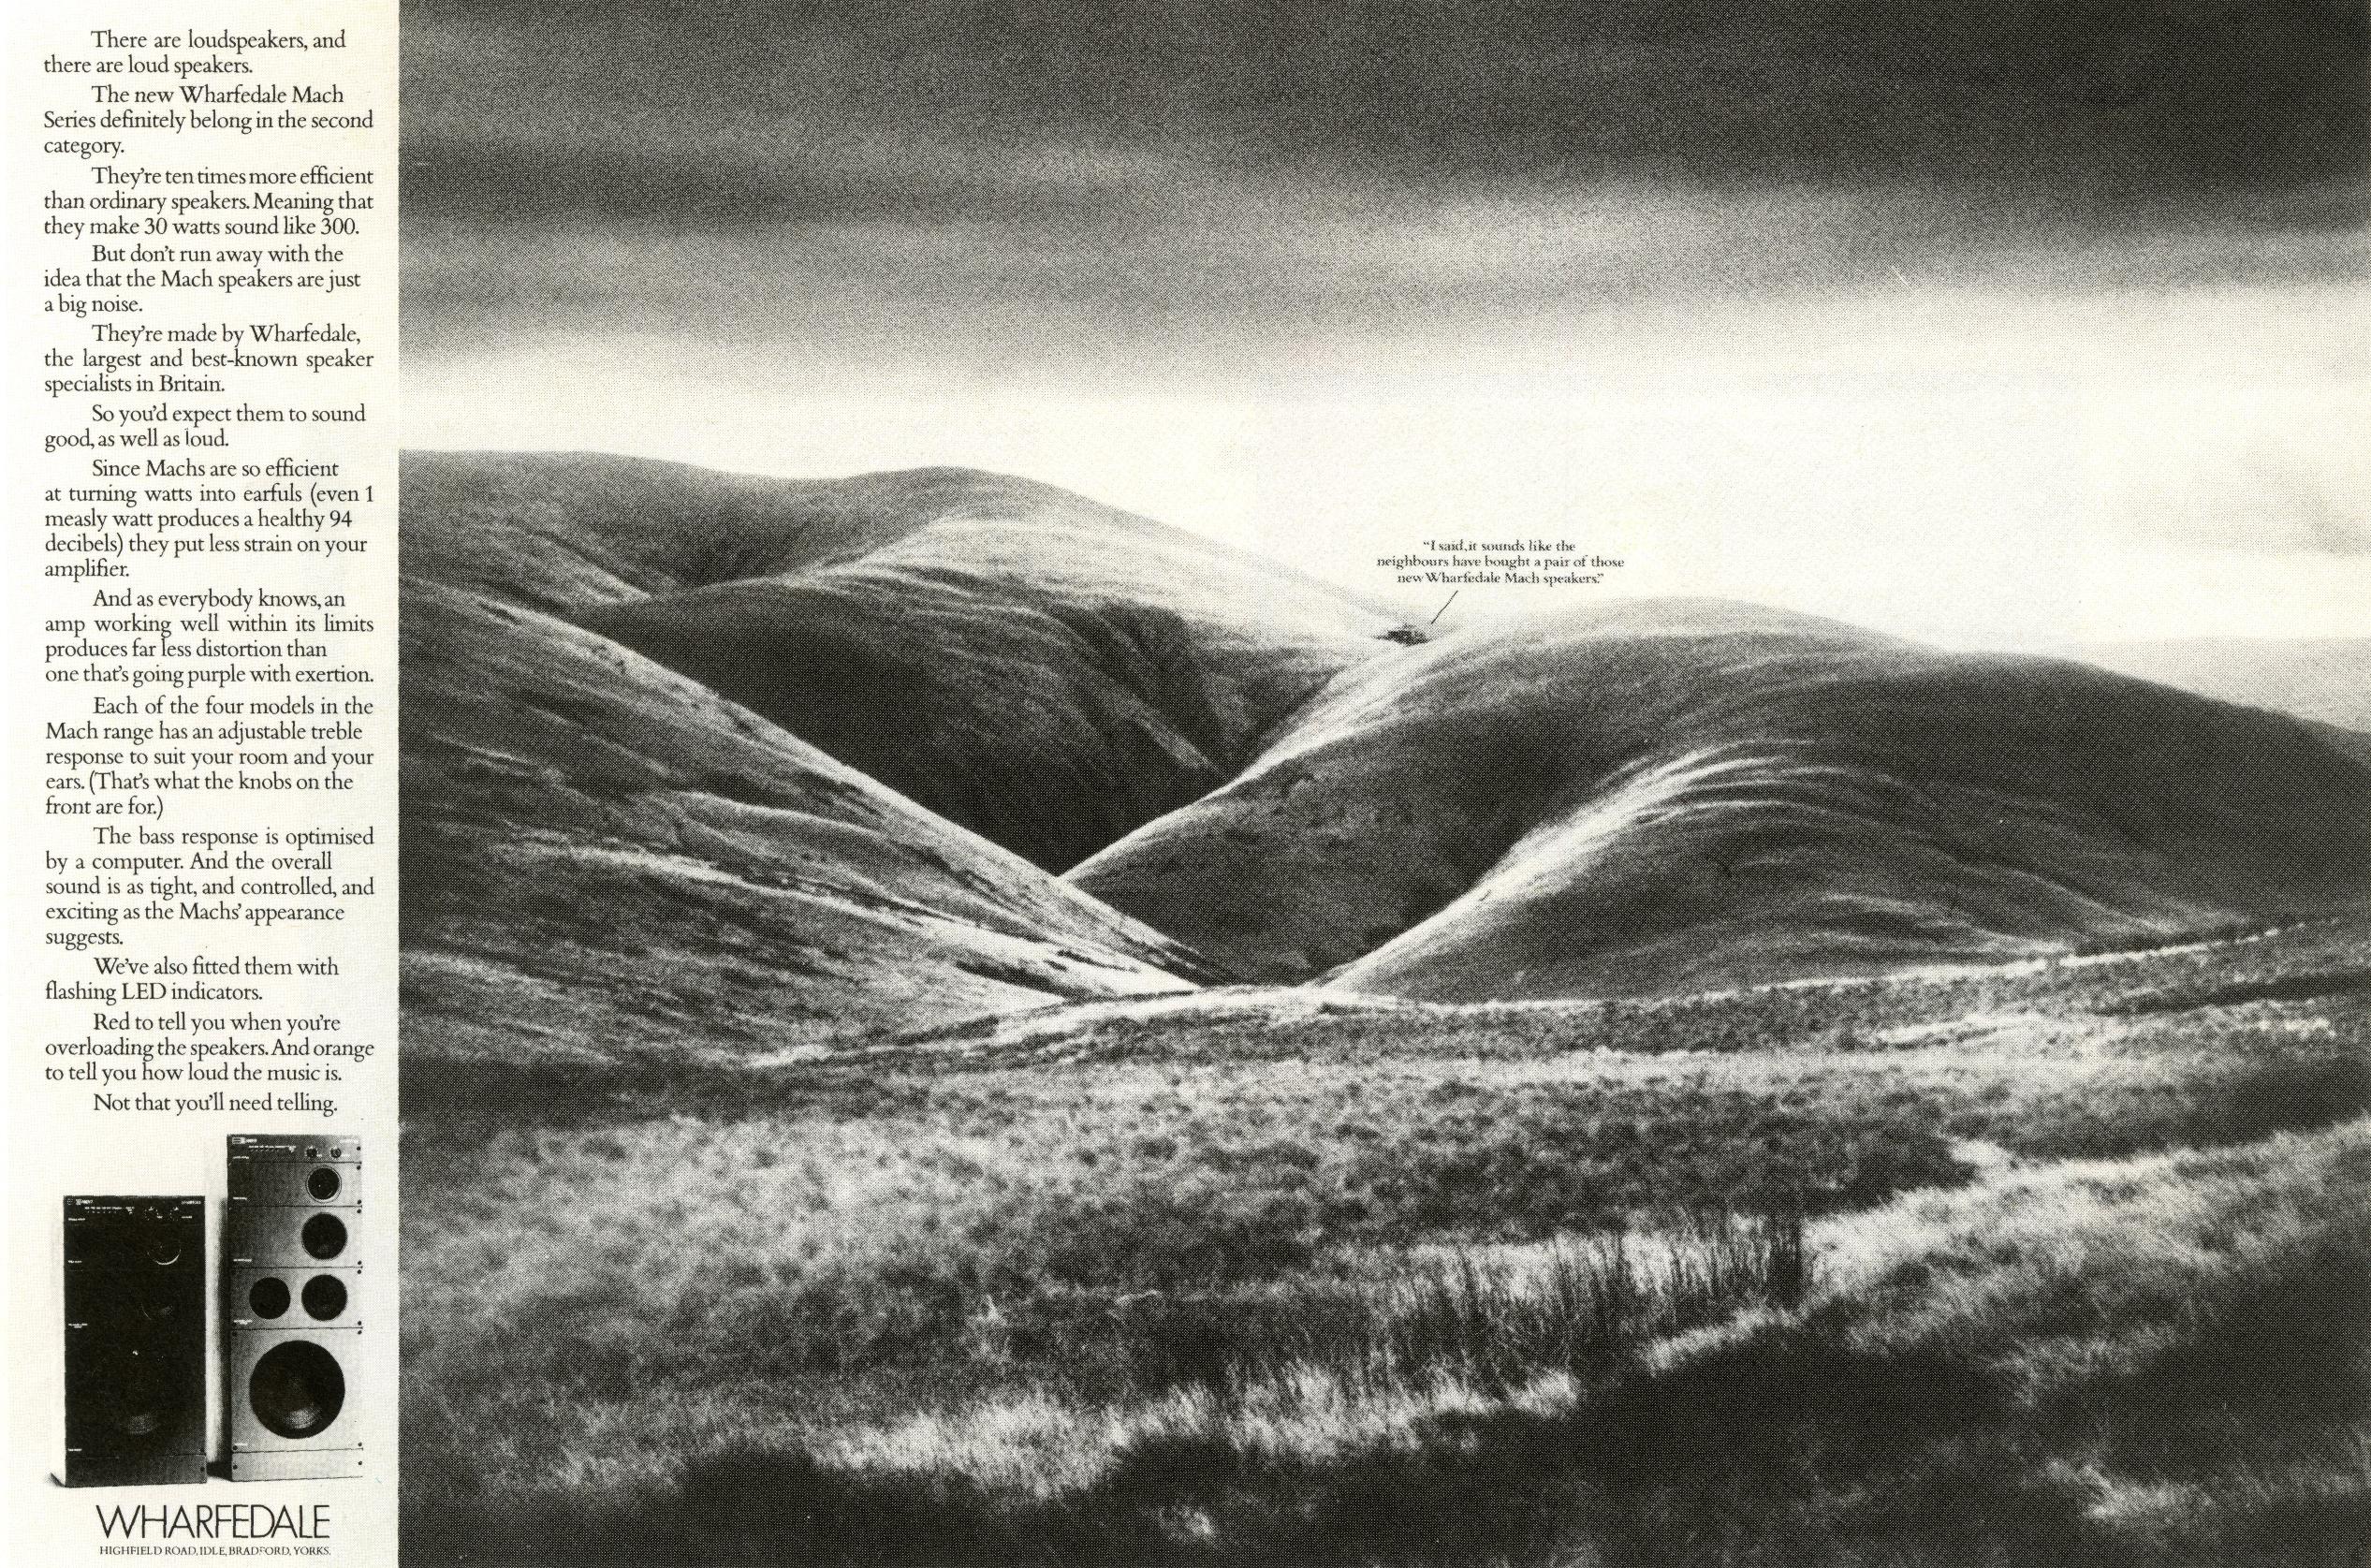 Barney Edwards,Wharfdale 'Hills', Saatchi 4-01